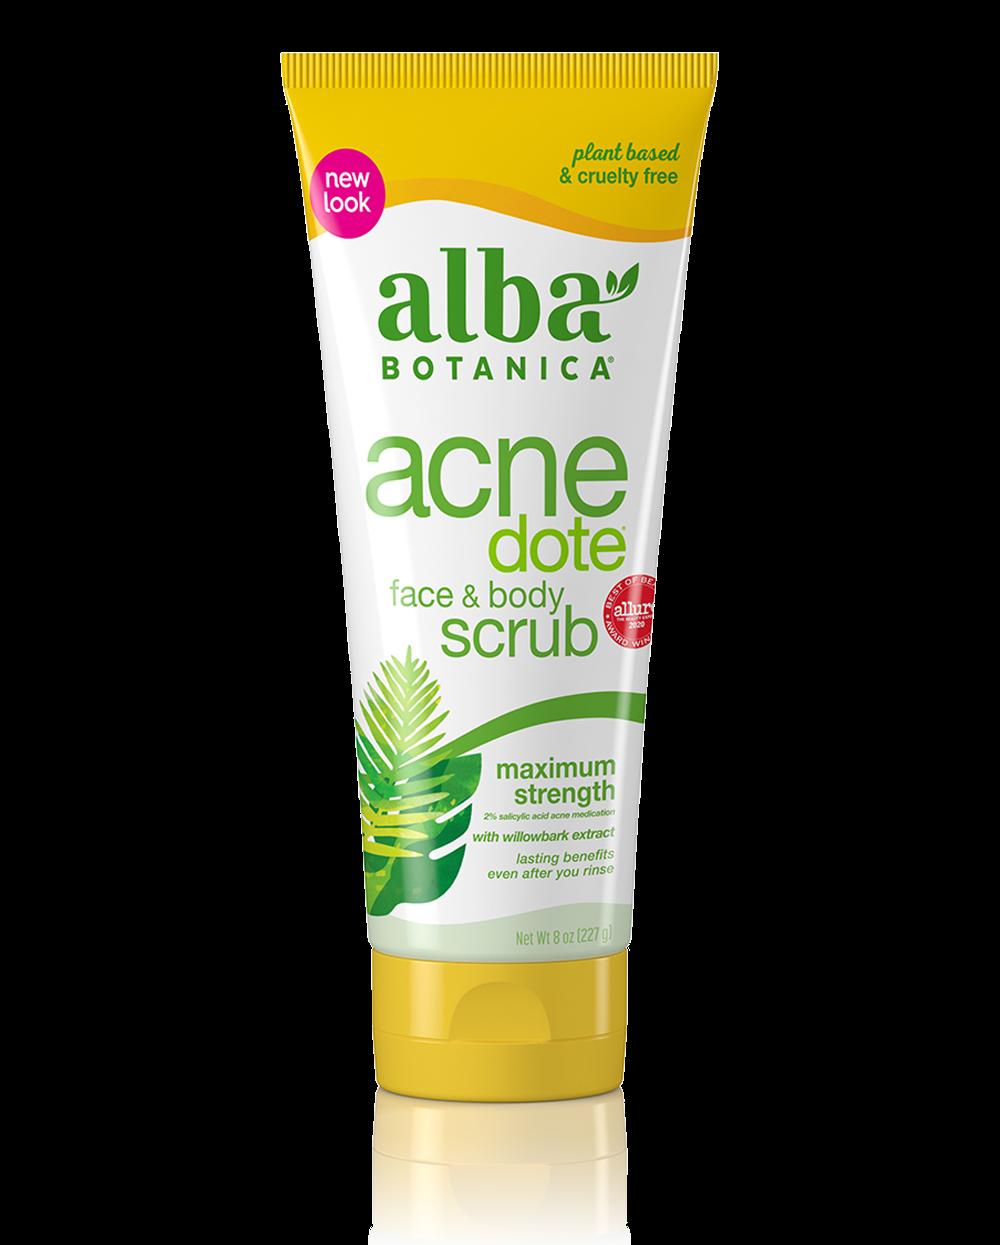 Alba Botanica Acnedote Face & Body Scrub 227g